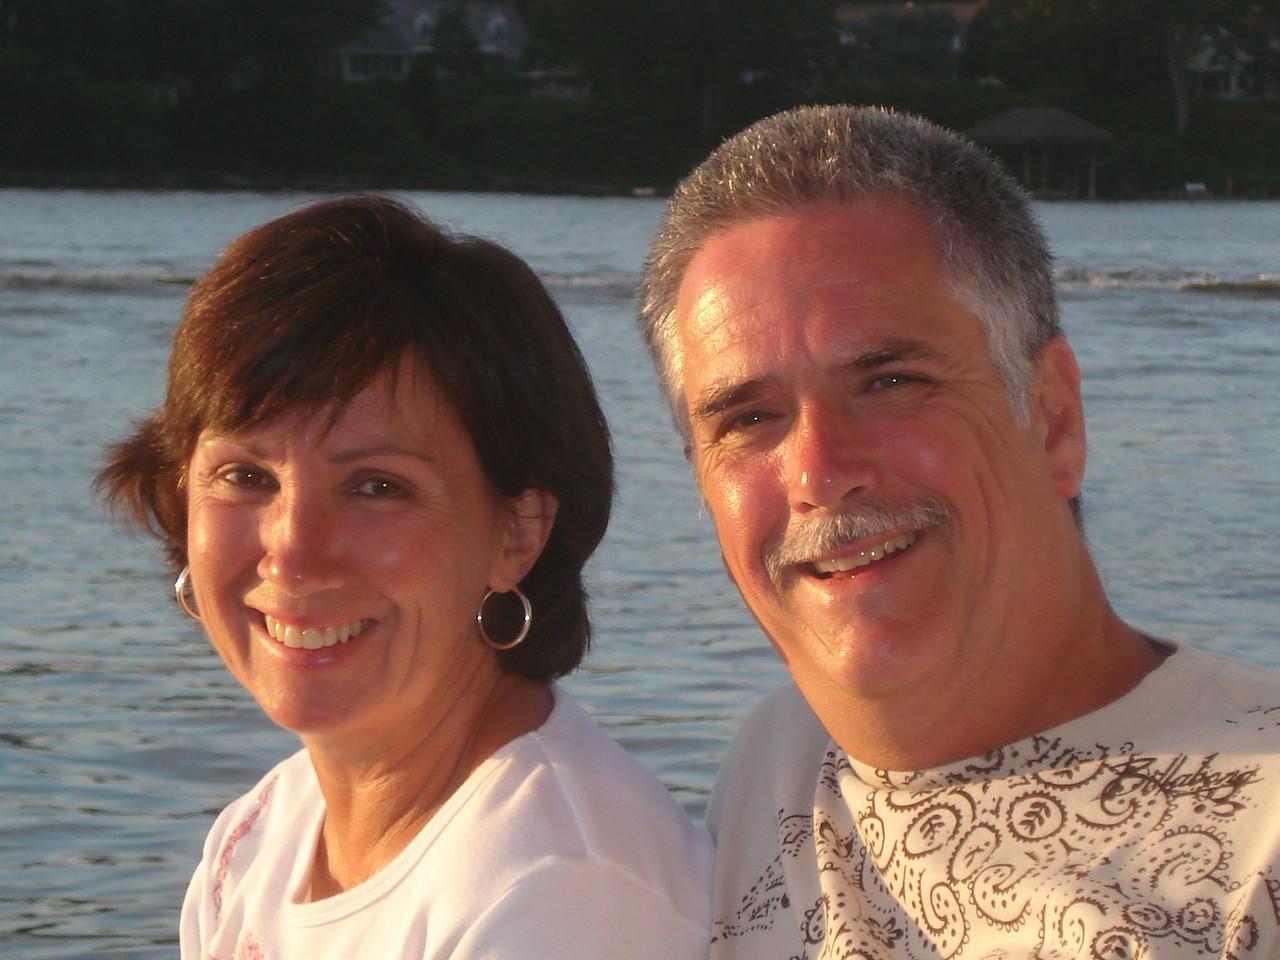 Bev & Greg - Cruising the Manasquan River, New Jersey